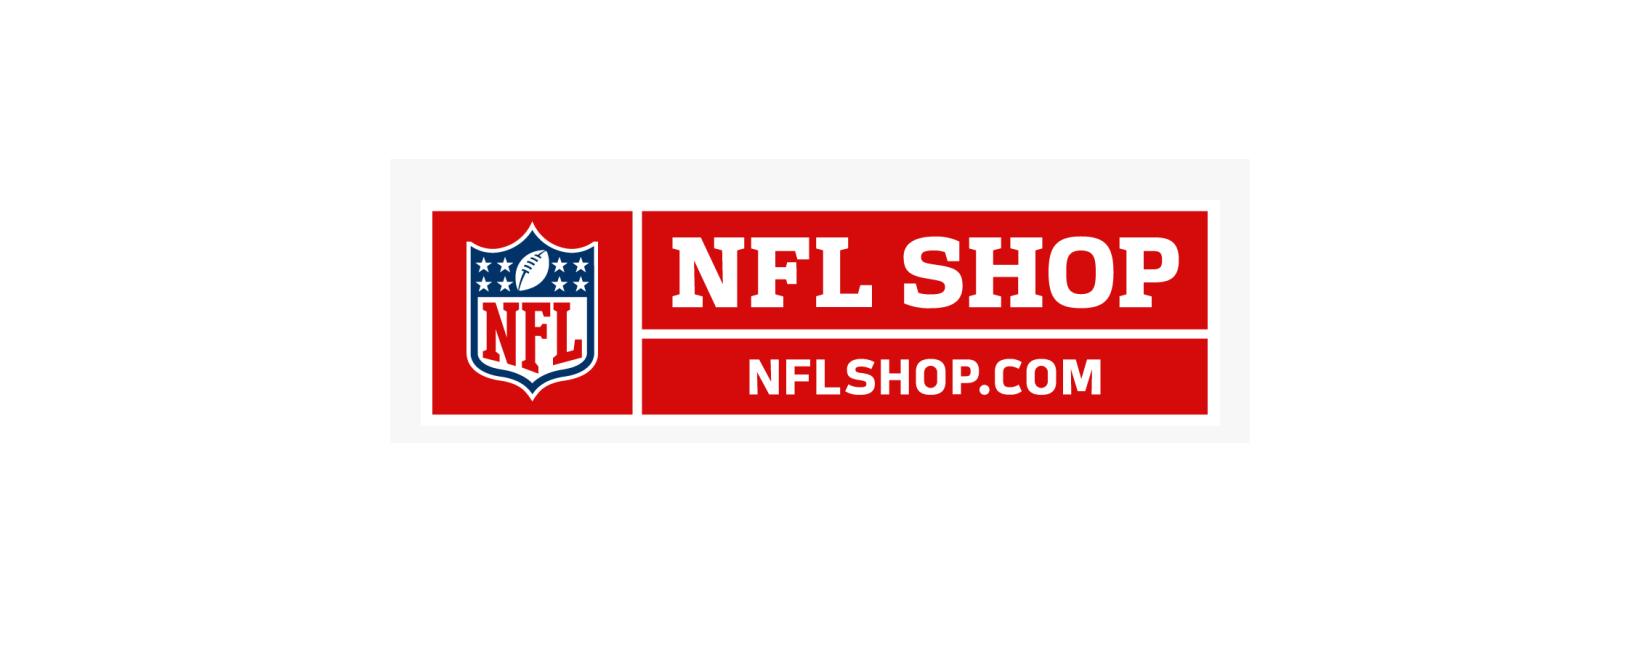 NFL Shop Discount Code 2021